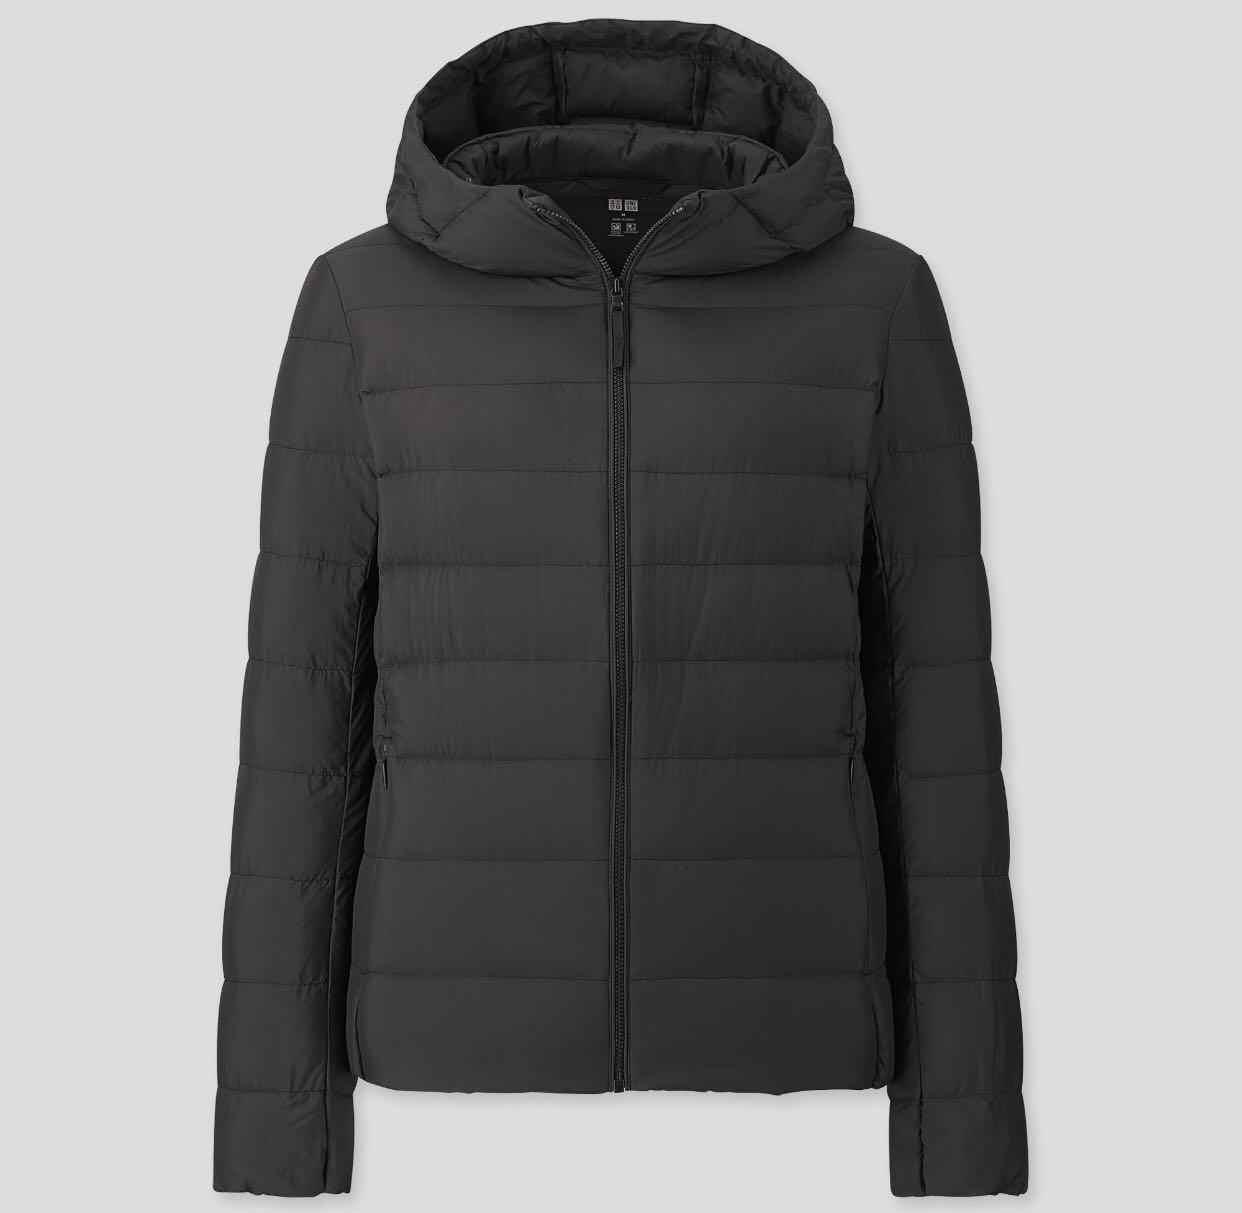 Black Uniqlo Jacket